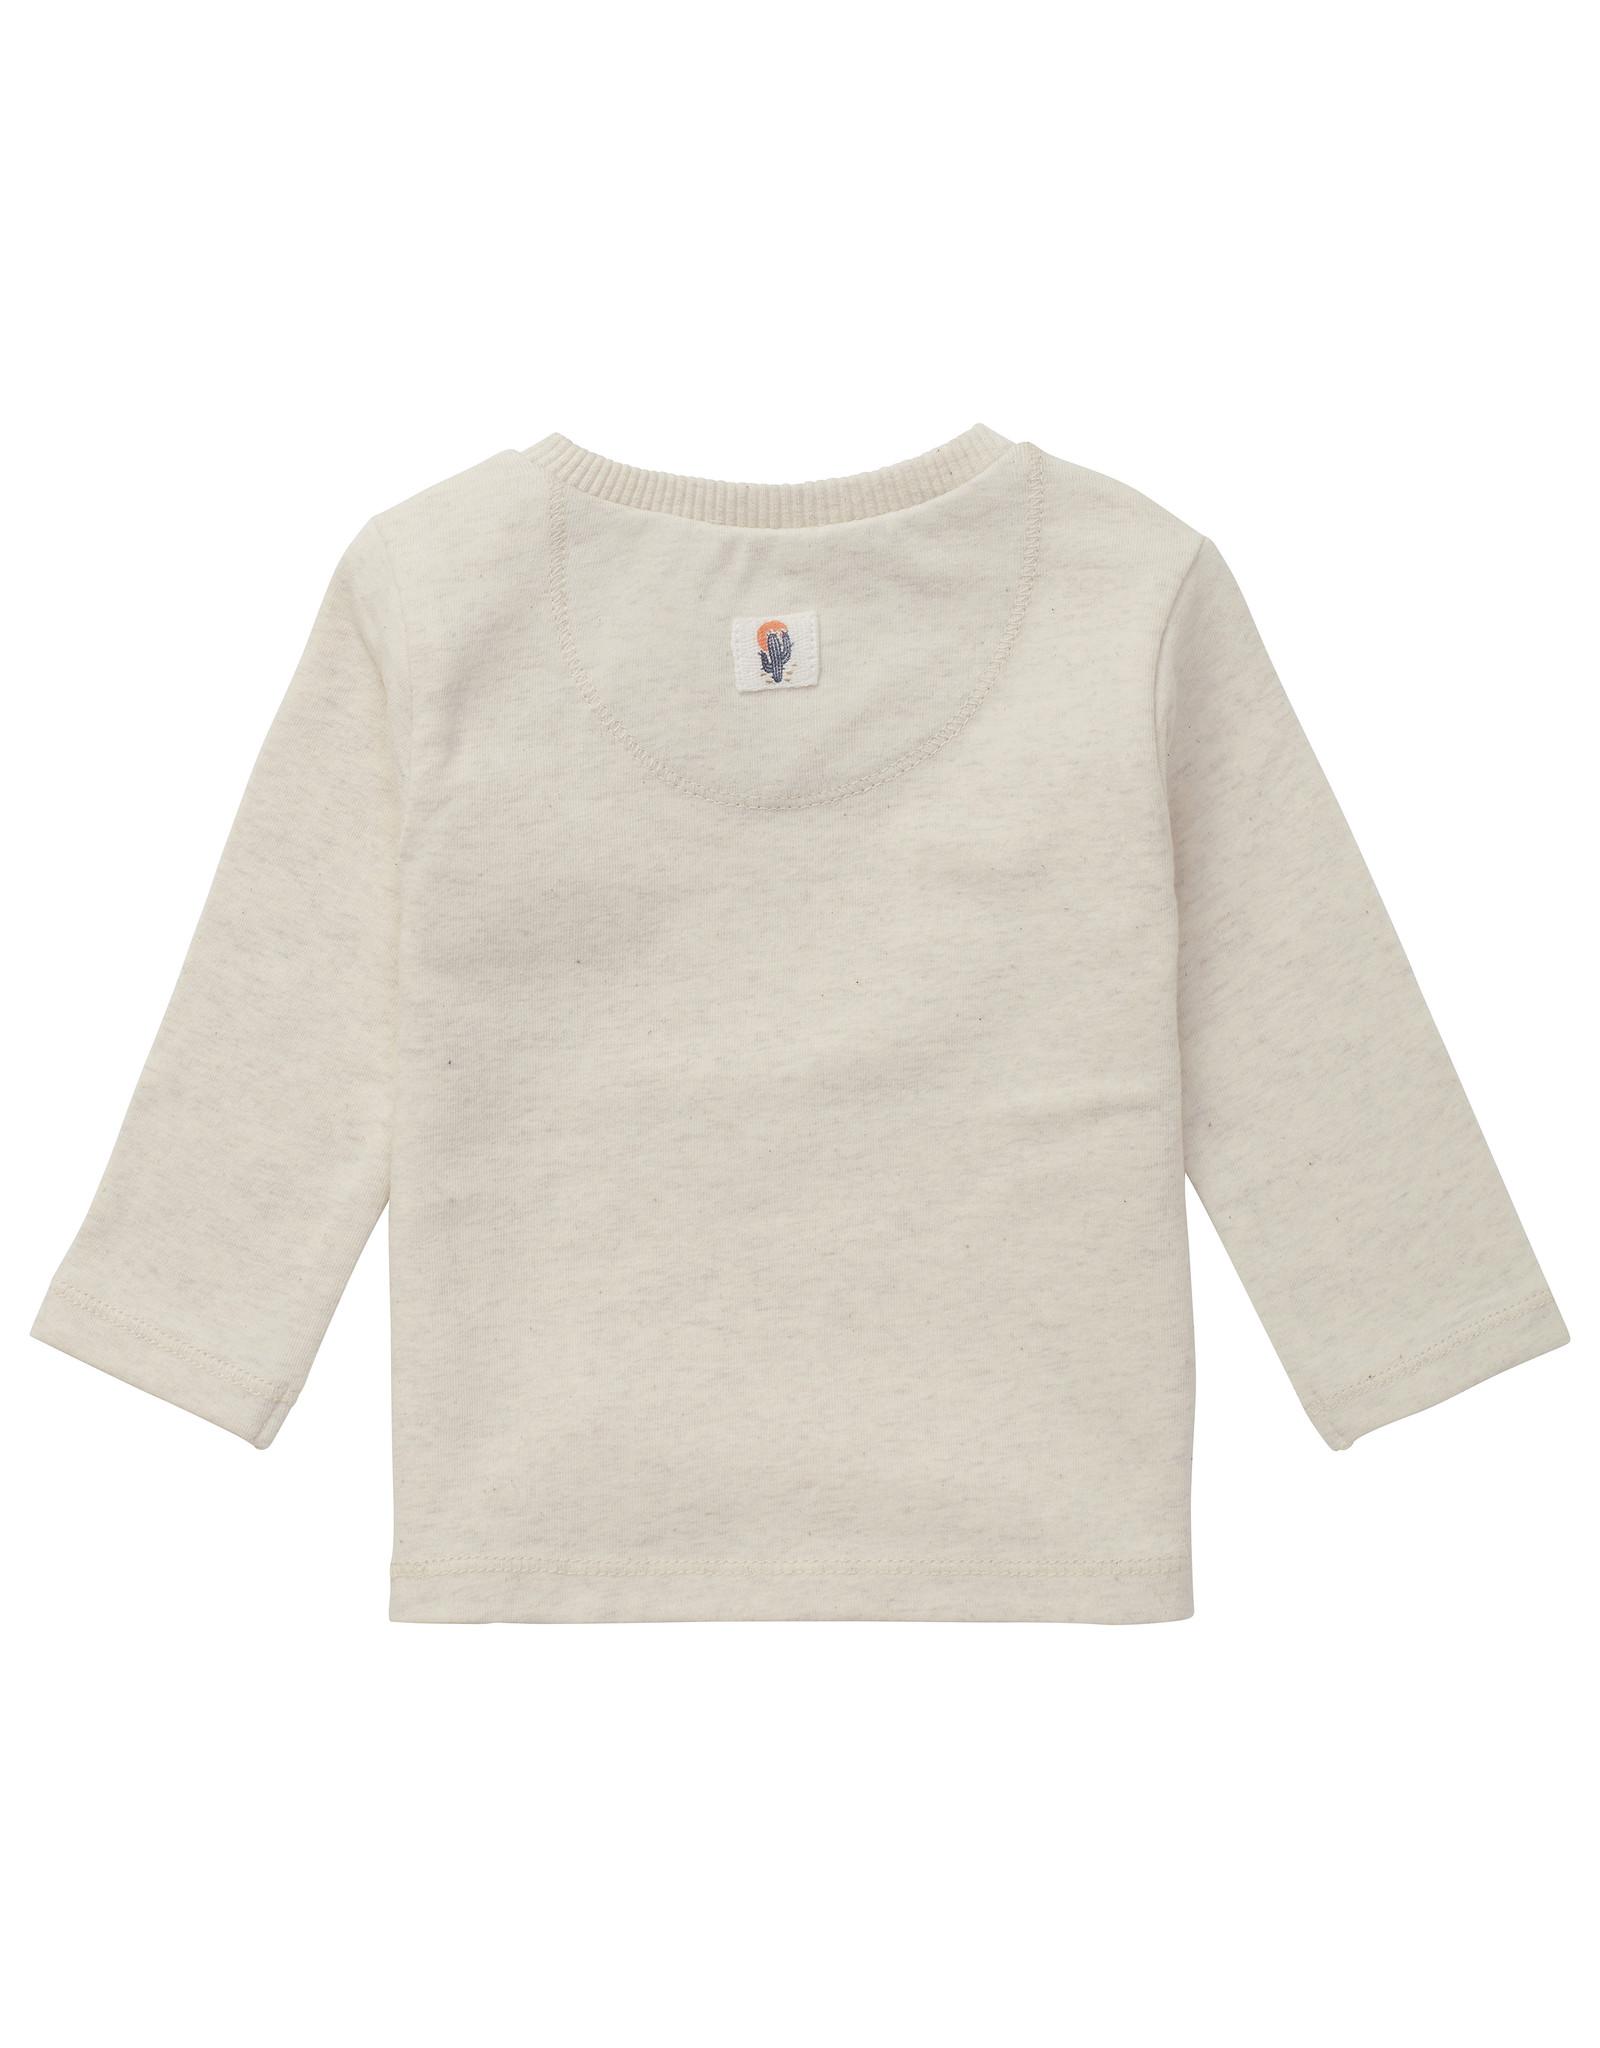 Noppies B T-Shirt LS Torpoint, RAS1202 Oatmeal